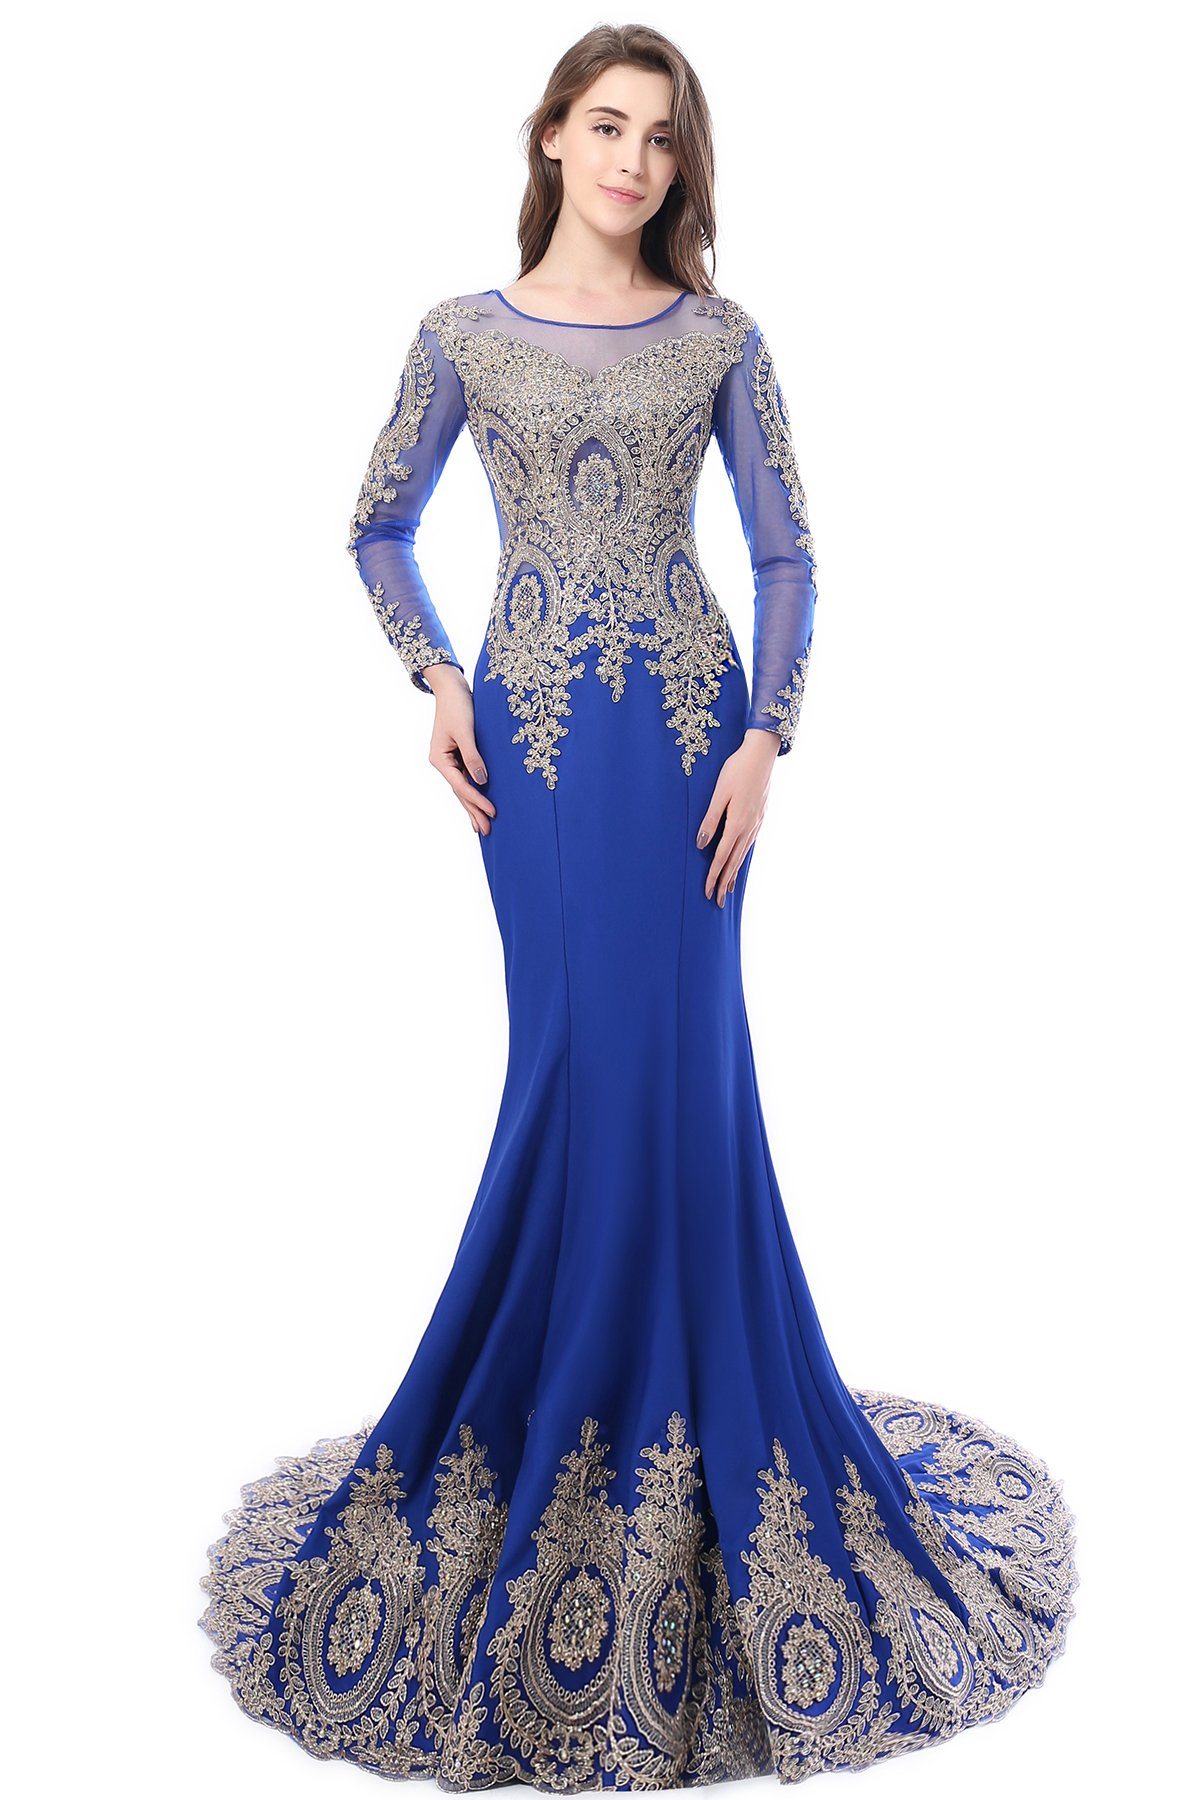 Babyonlinedress Womens Long Sleeve Lace Formal Mermaid Prom Evening Dress